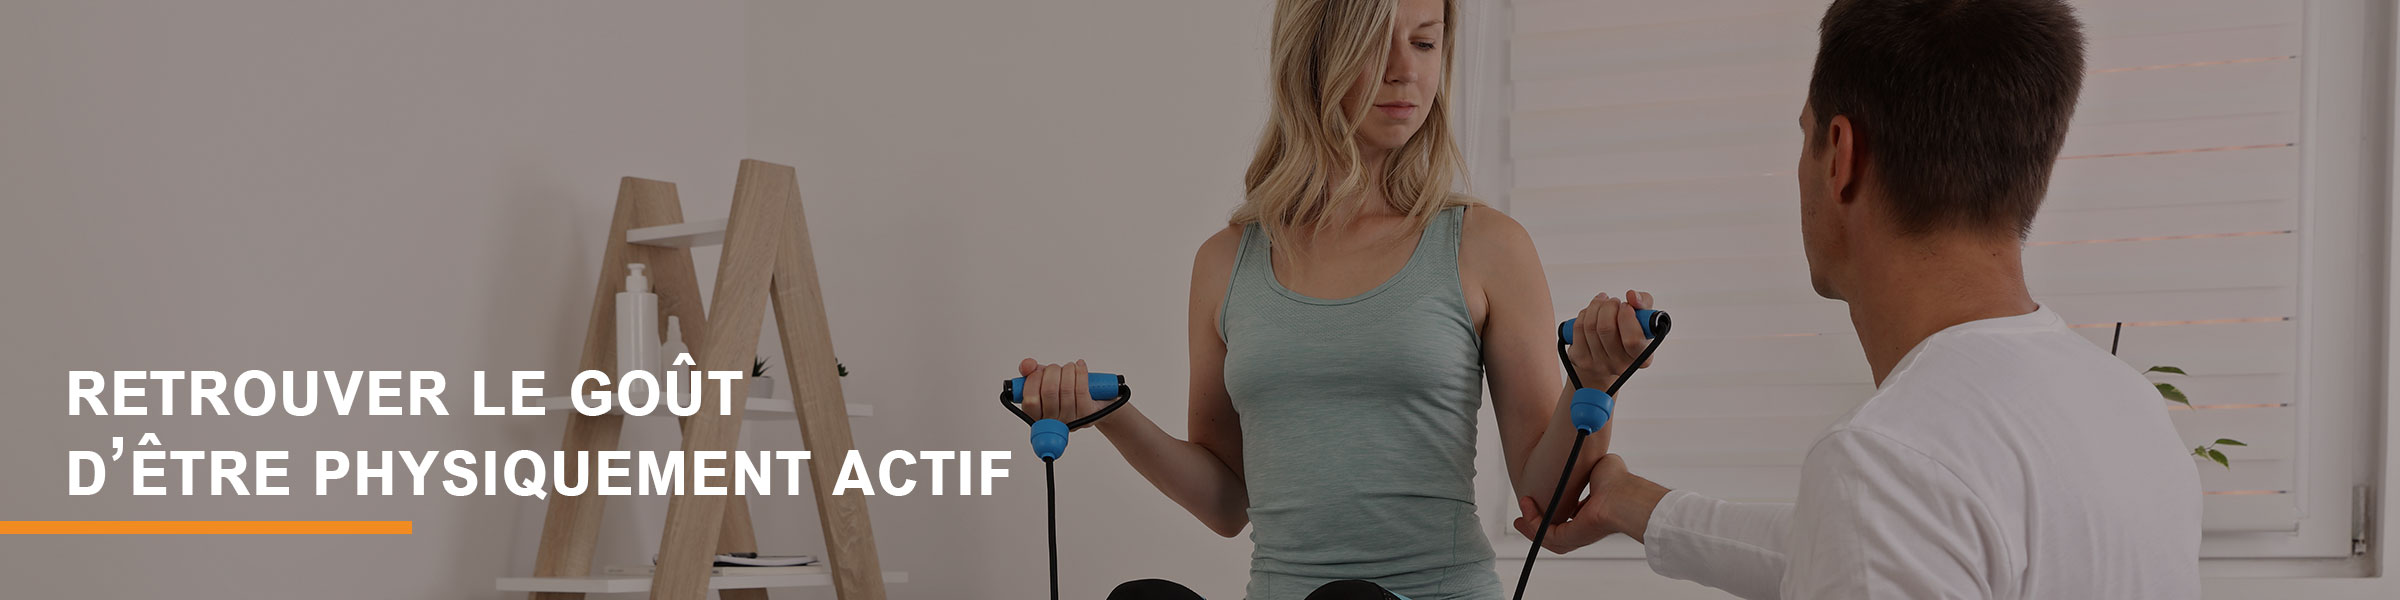 https://cliniquepraxis.ca/wp-content/uploads/2020/10/kinesiologue-avec-femme-exercice.jpg